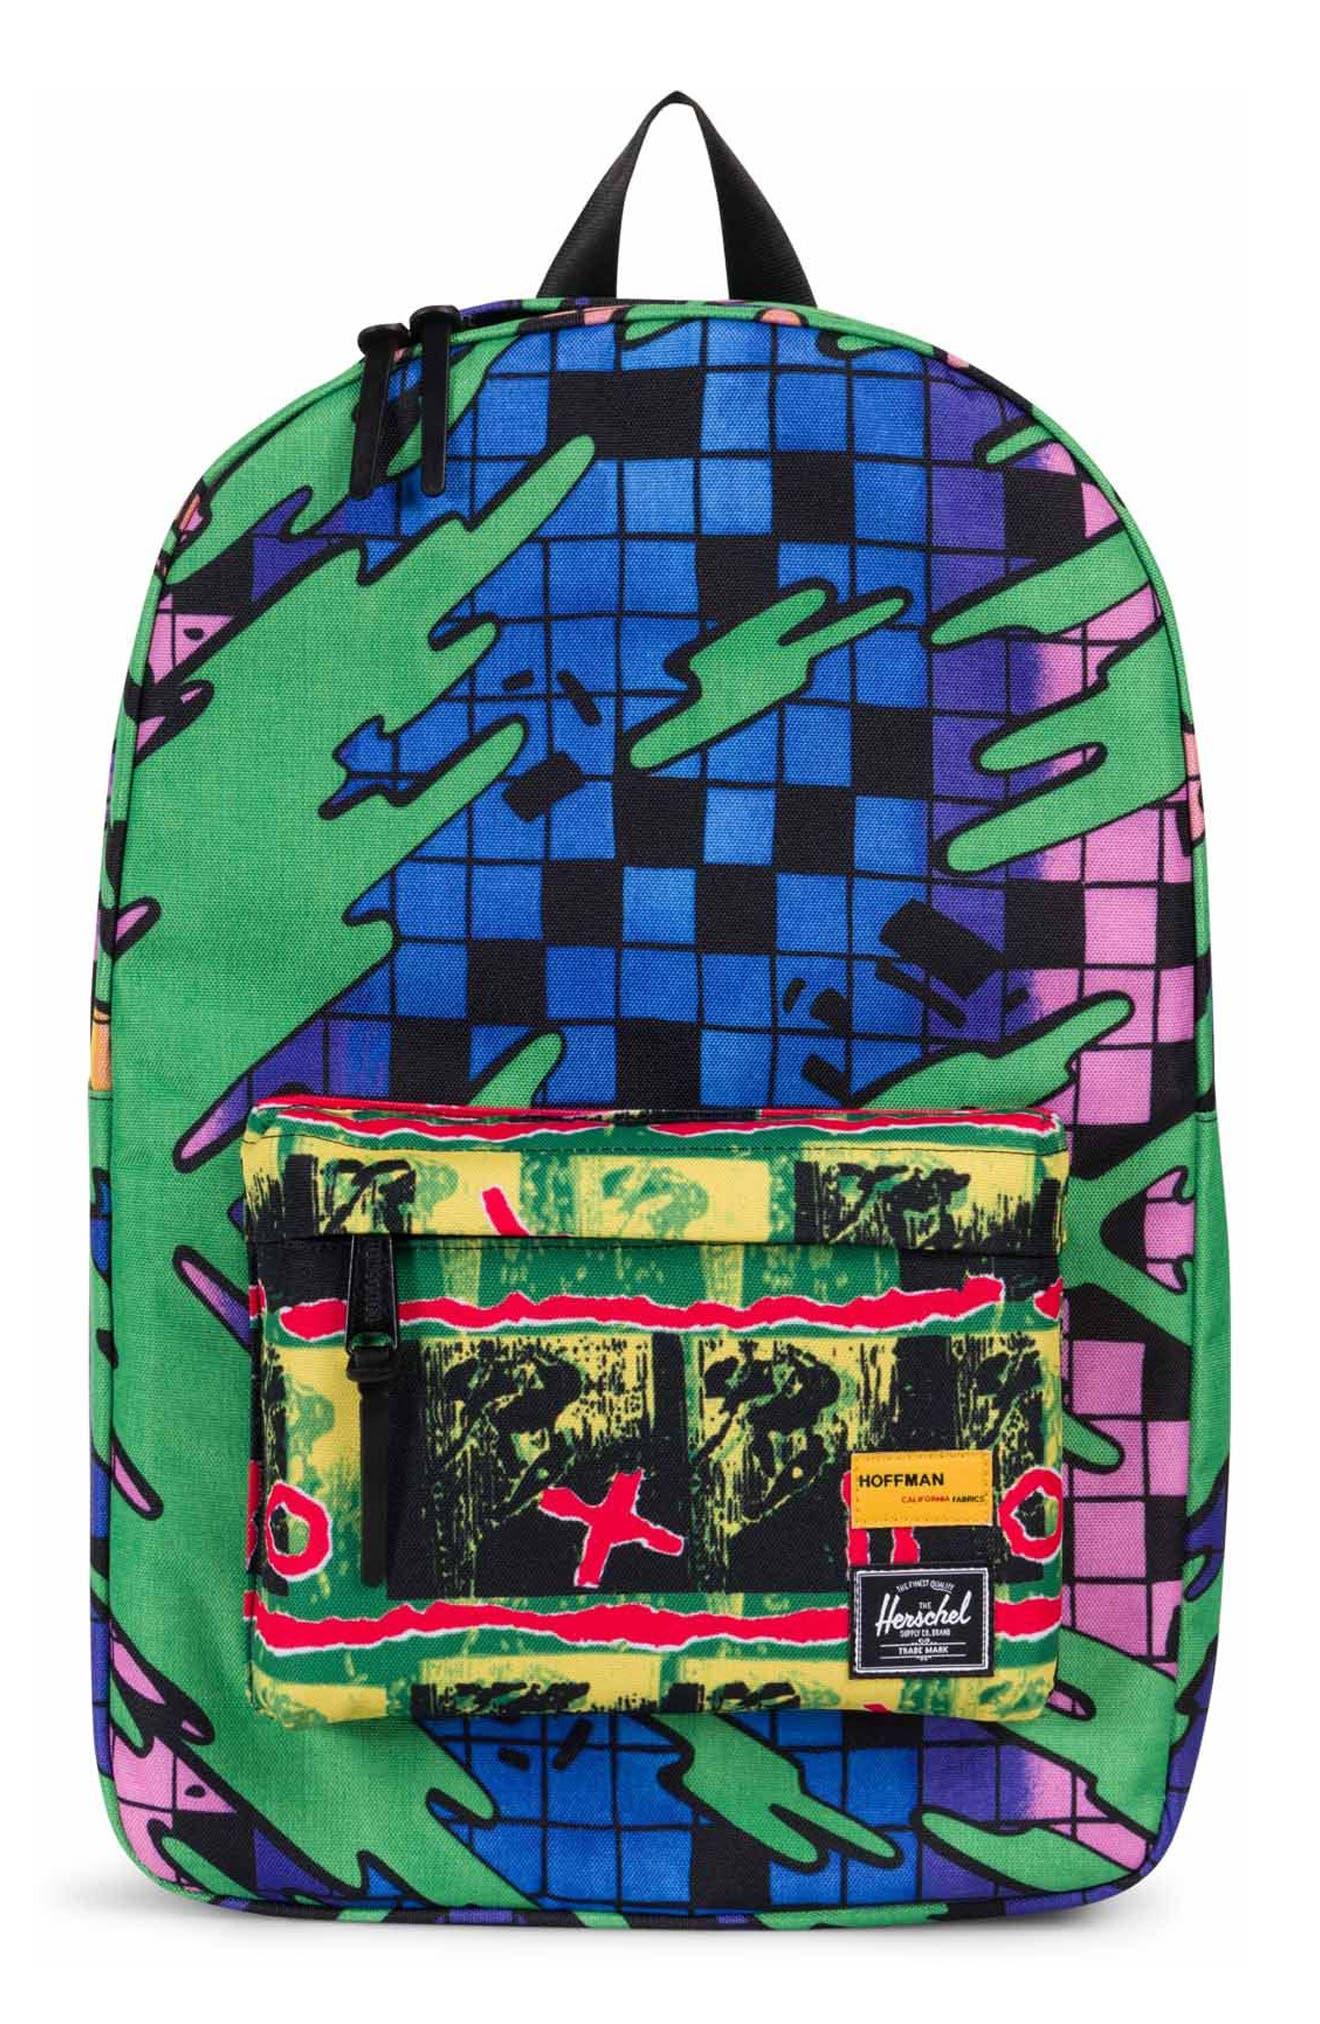 Hoffman Winlaw Backpack,                             Main thumbnail 1, color,                             Green